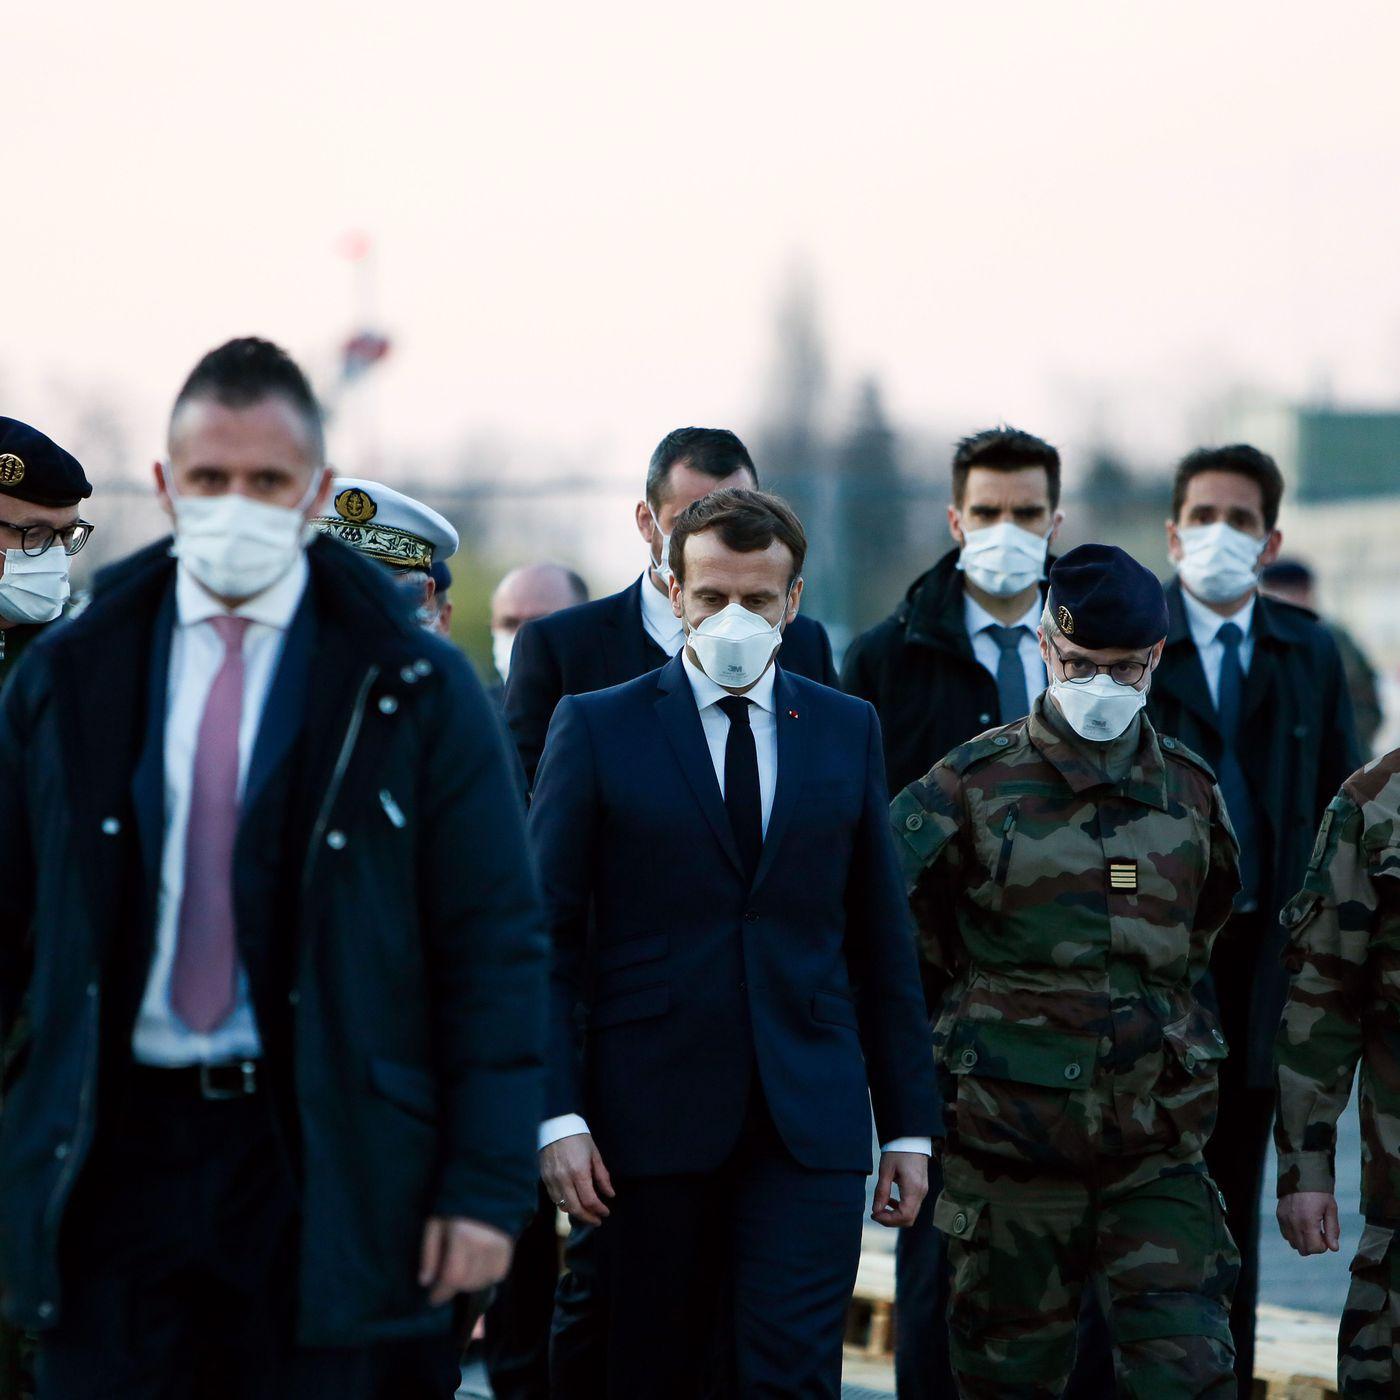 How France S President Emmanuel Macron Bungled His Coronavirus Response Vox